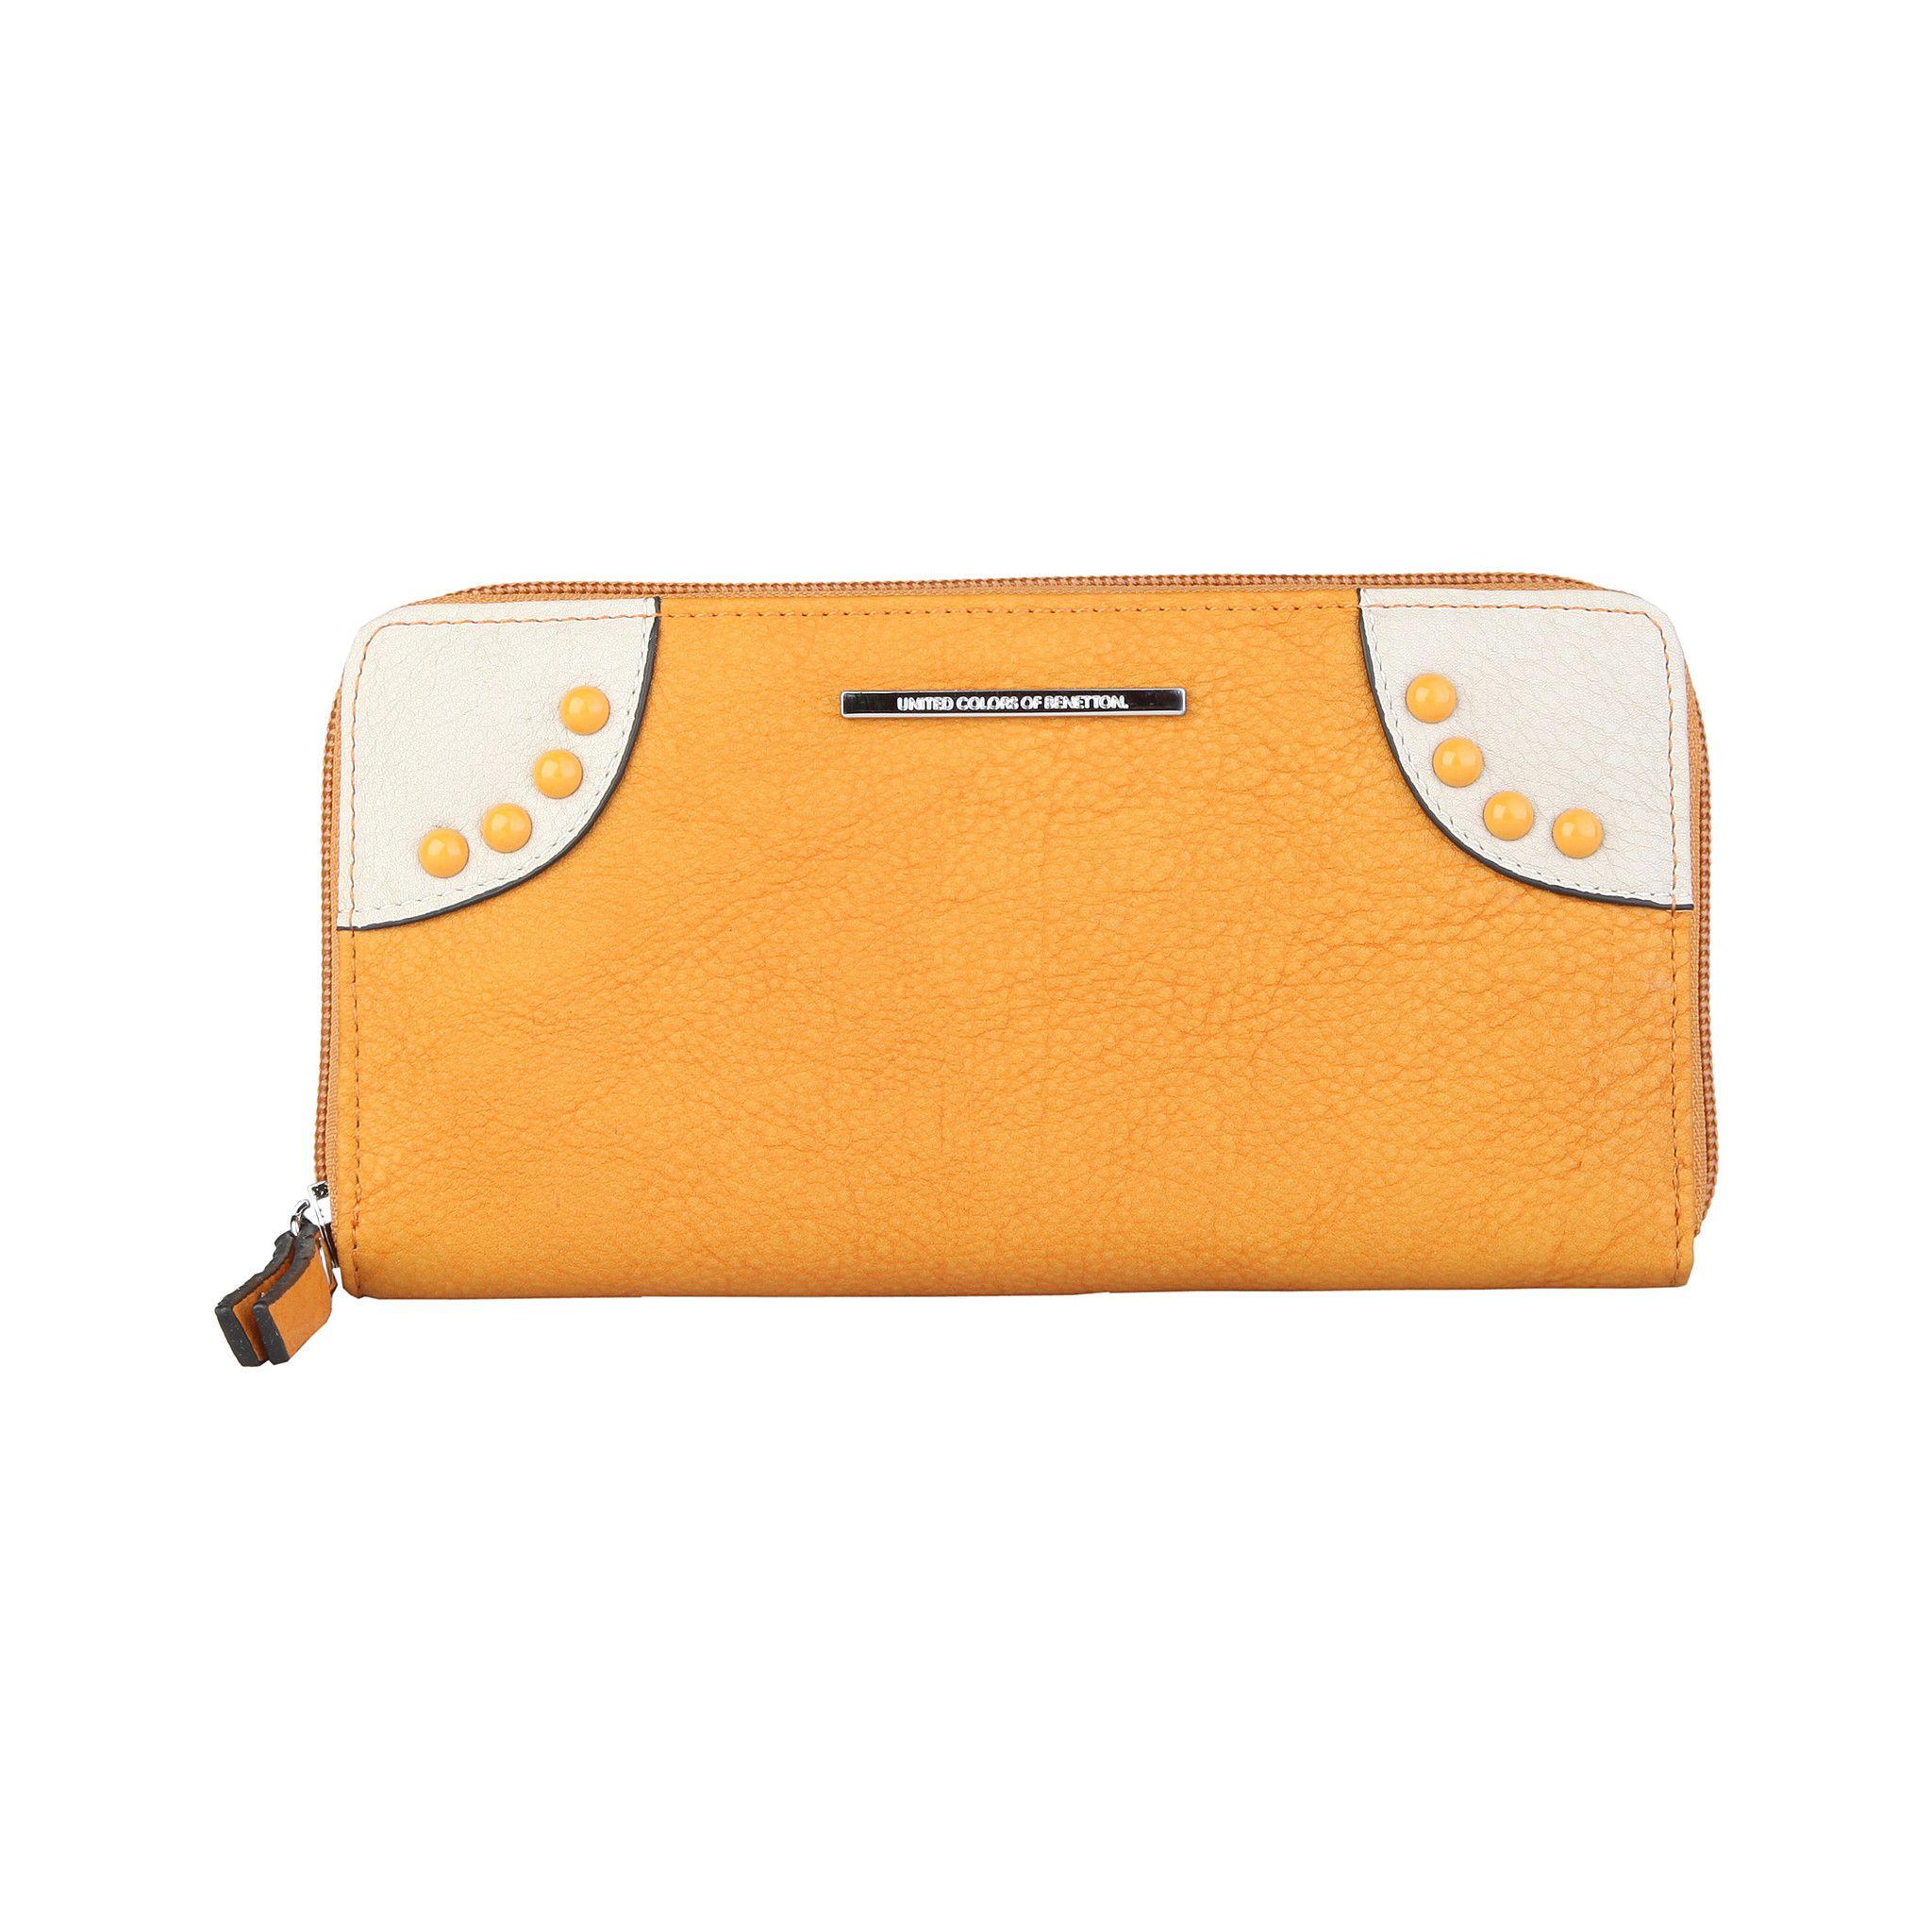 Benetton Bags On Sale #clothing #fashion #women #Bags #Handbags